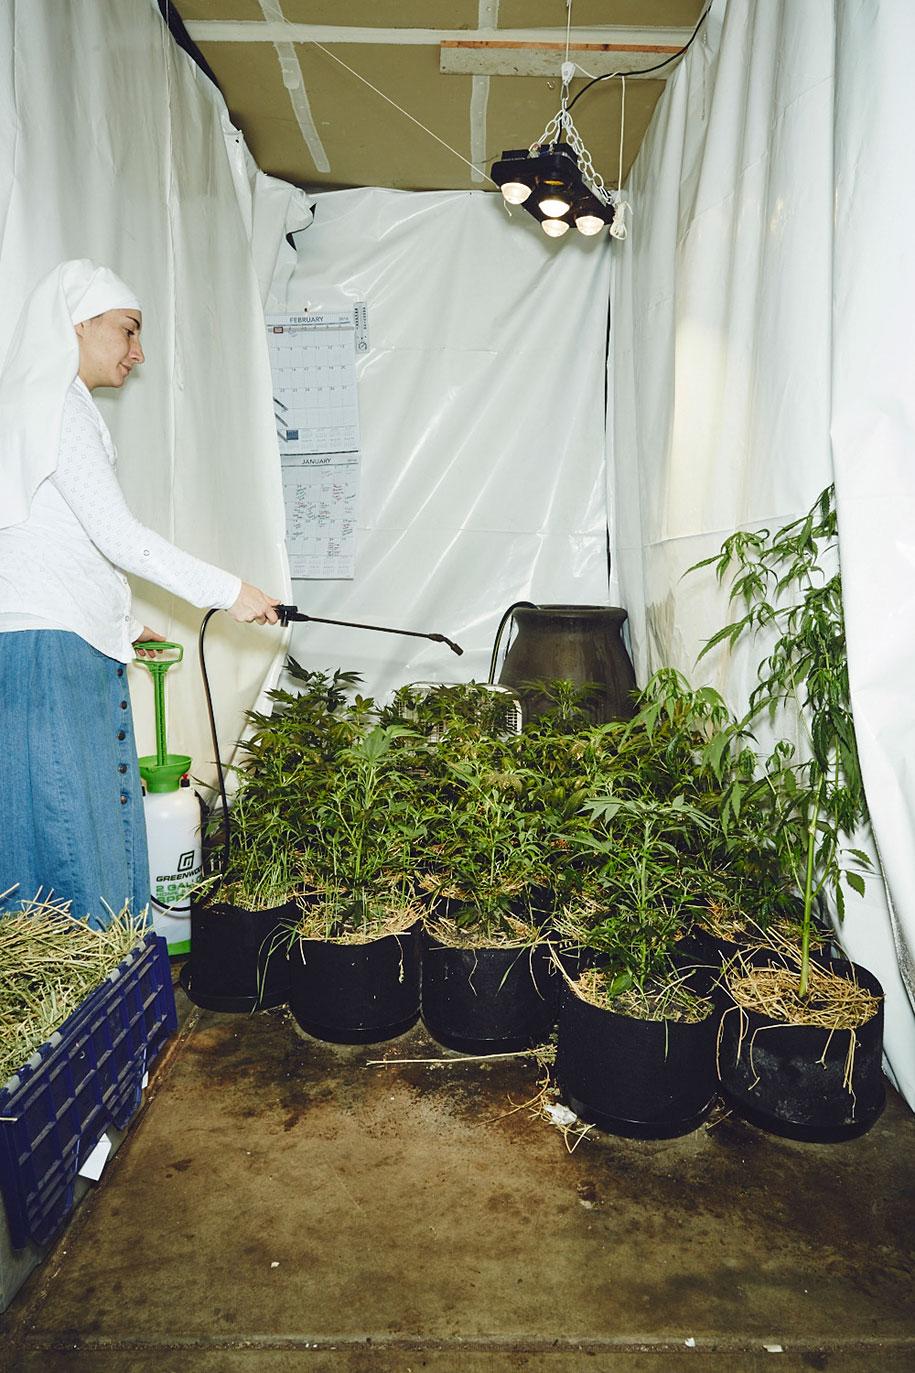 marijuana-horticulture-sisters-of-the-valley-shaughn-crawford-john-dubois-27